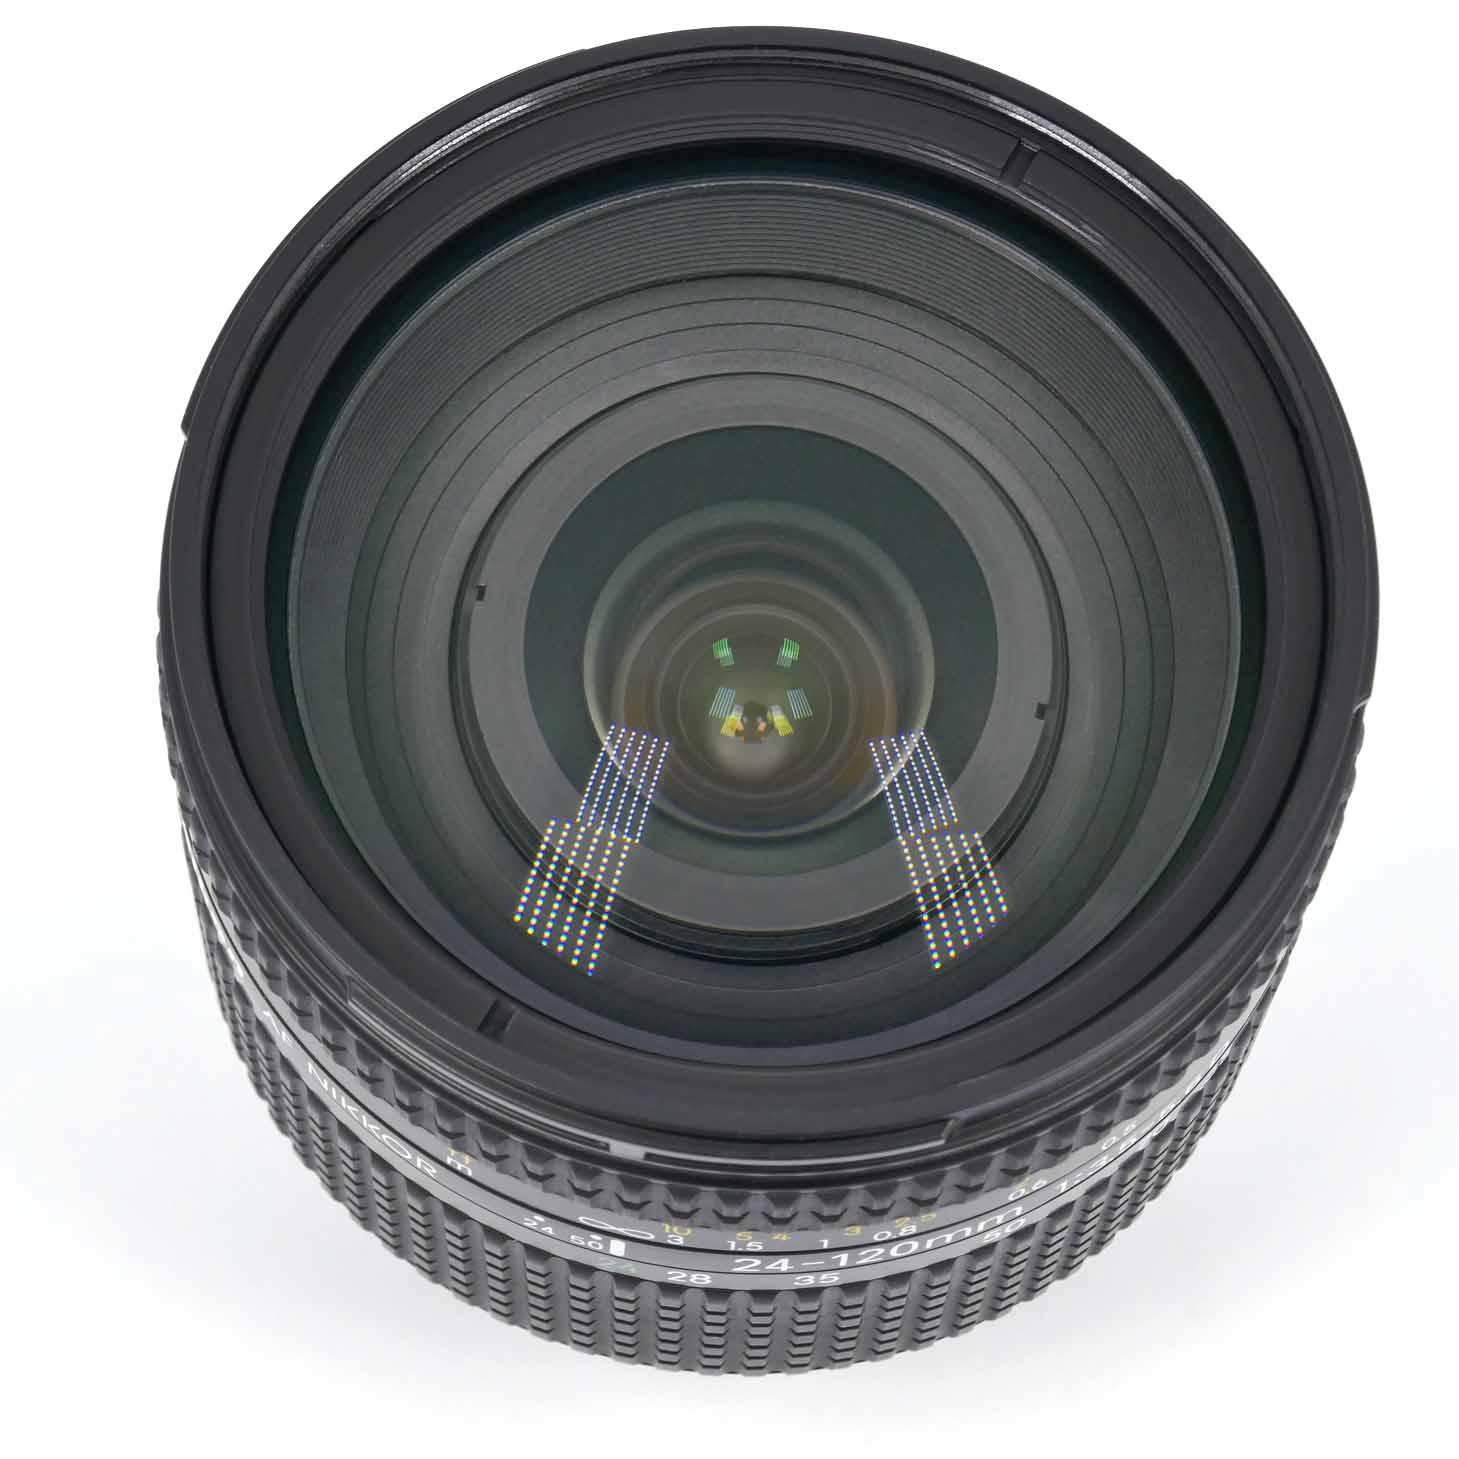 clean-cameras-Nikon-AF-24-120-3.5_5.6-IF-01